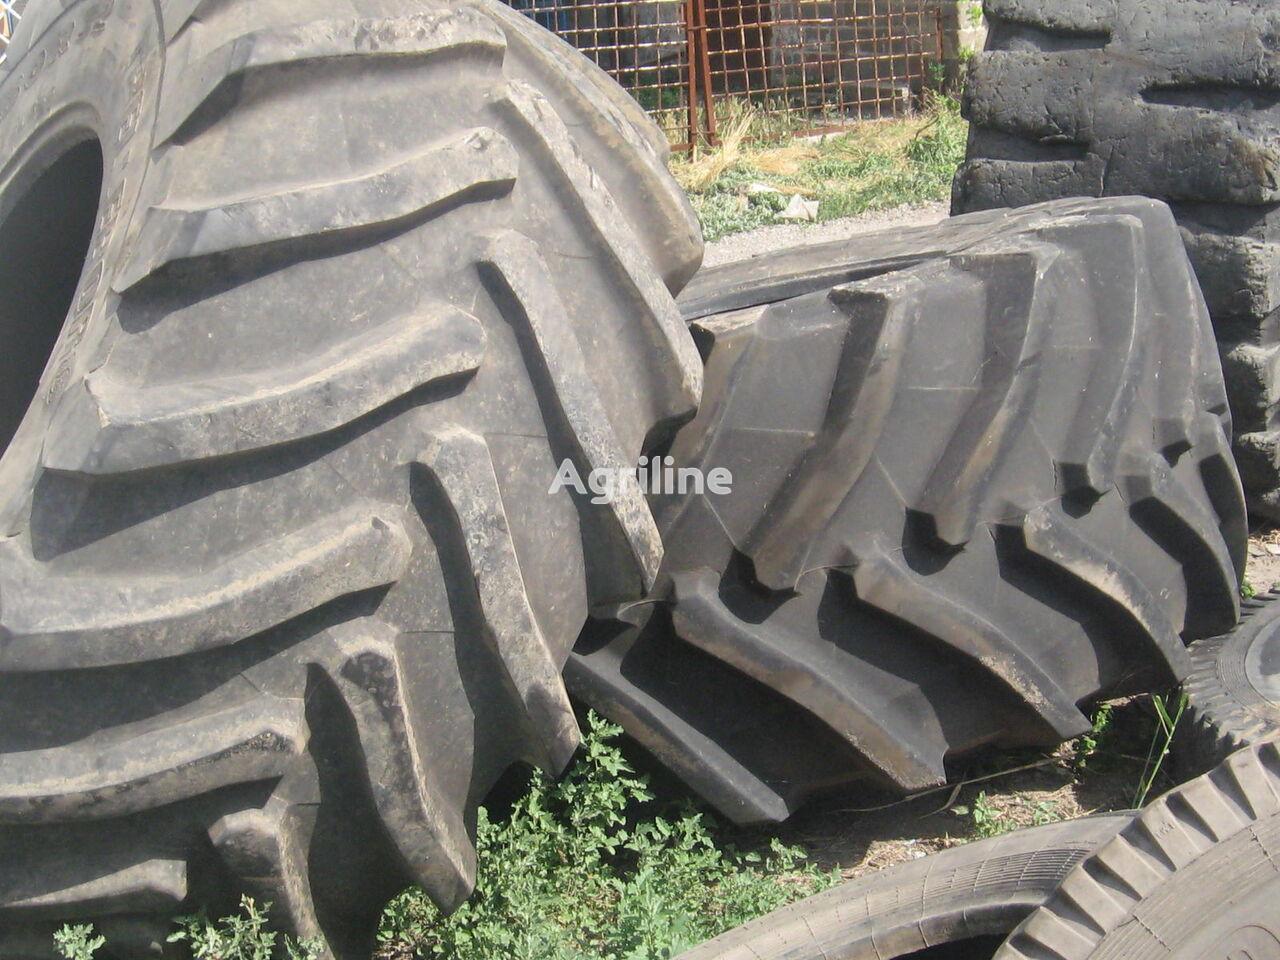 Alliance tractor tyre